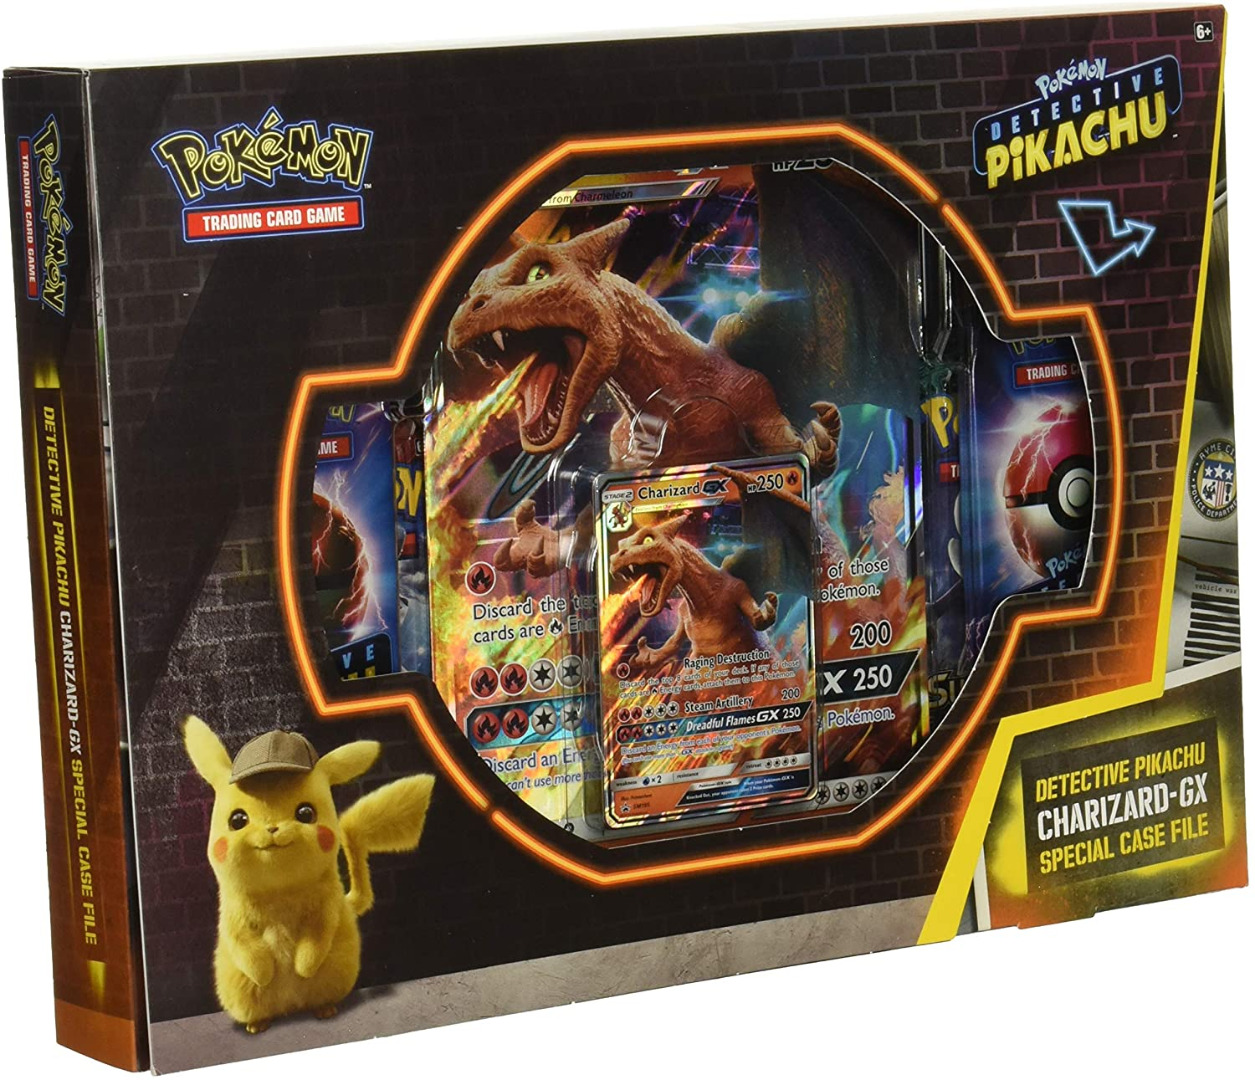 Pokémon Detective Pikachu Charizard-GX (English)